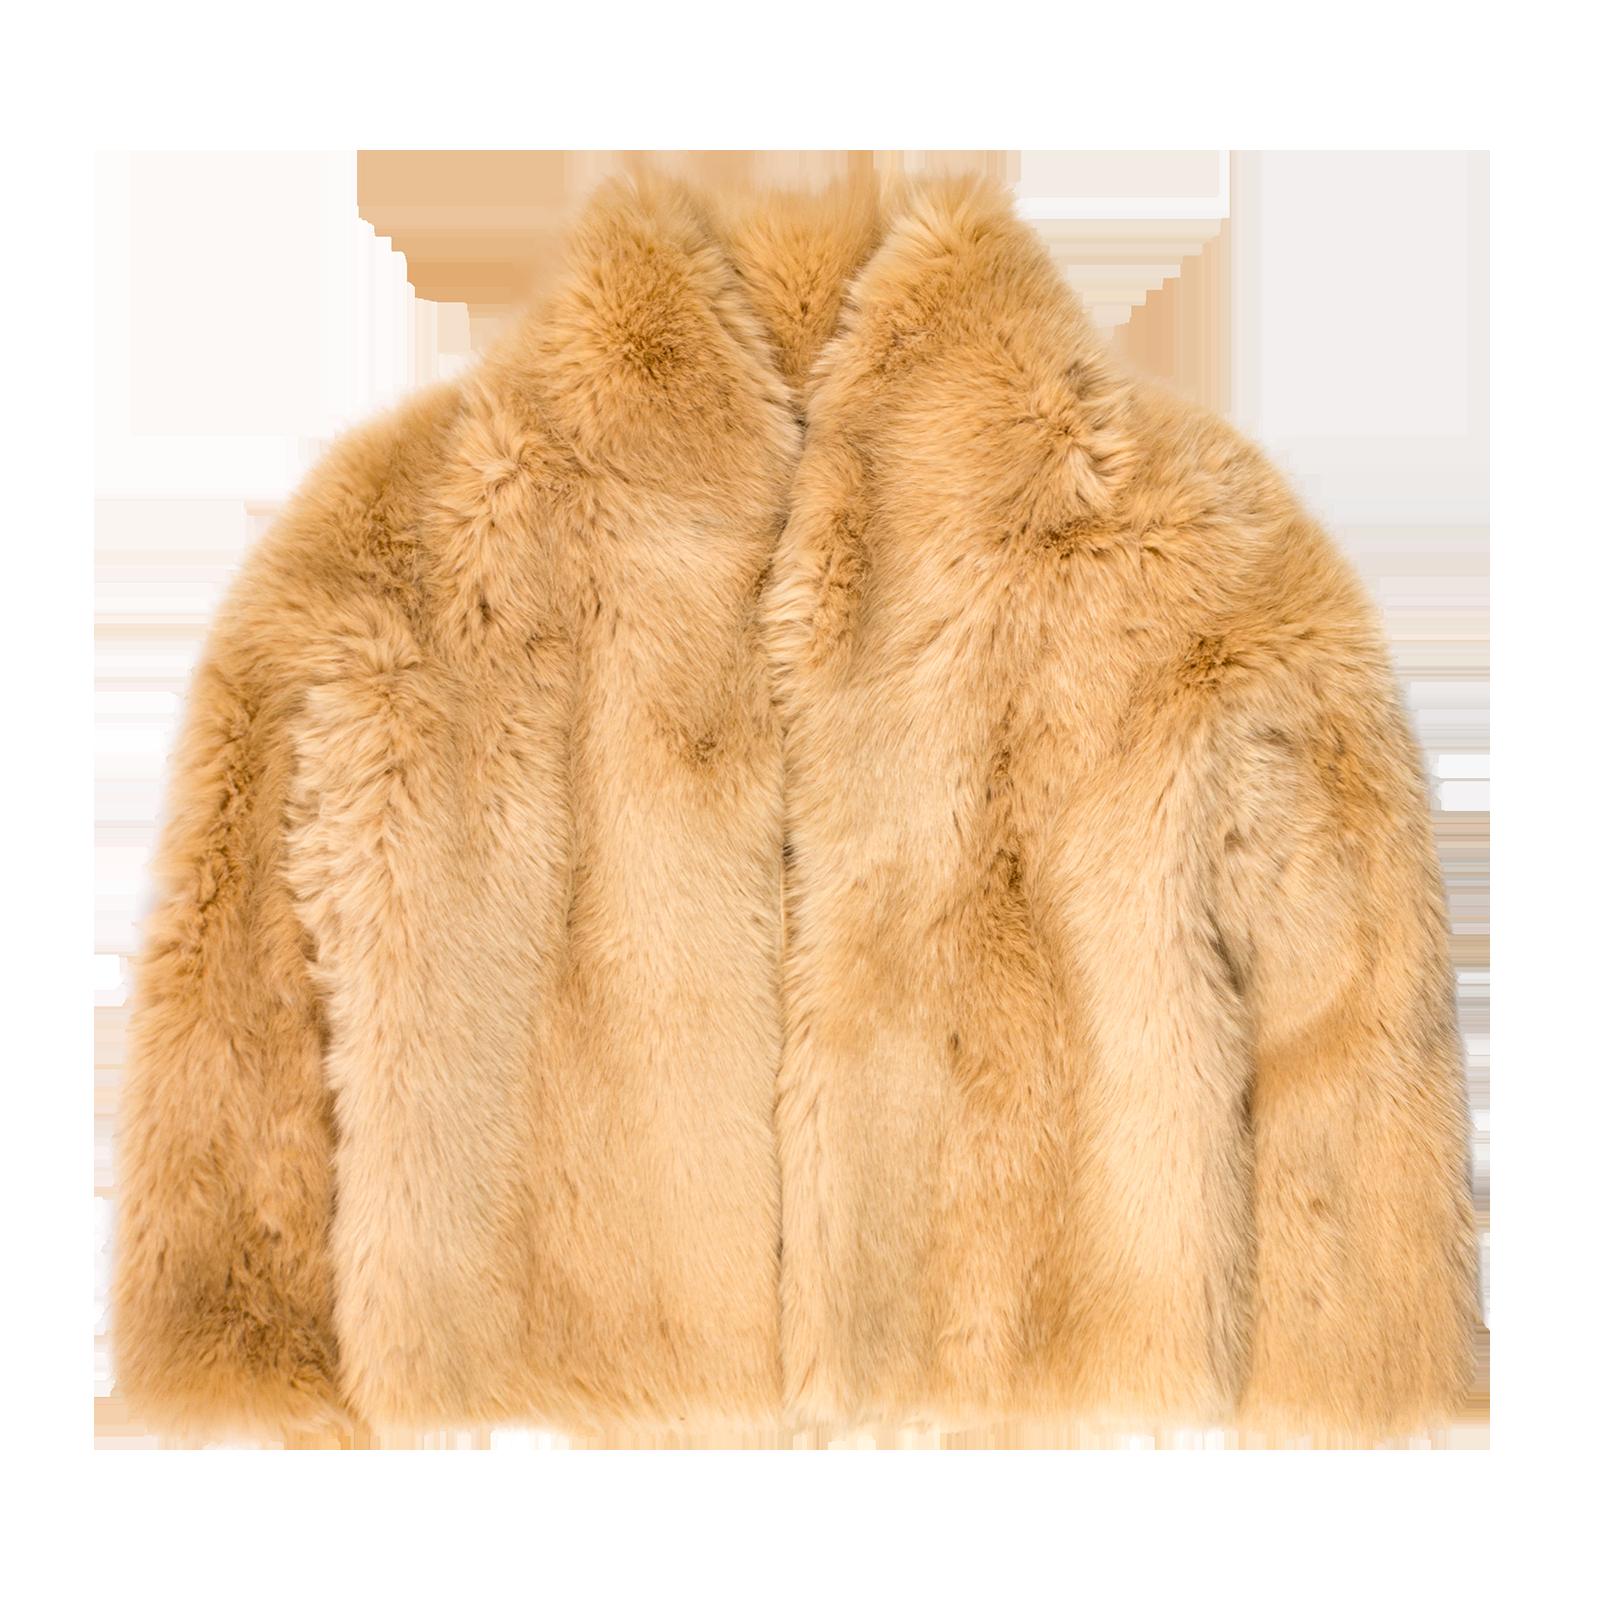 Faux fur coat product photography